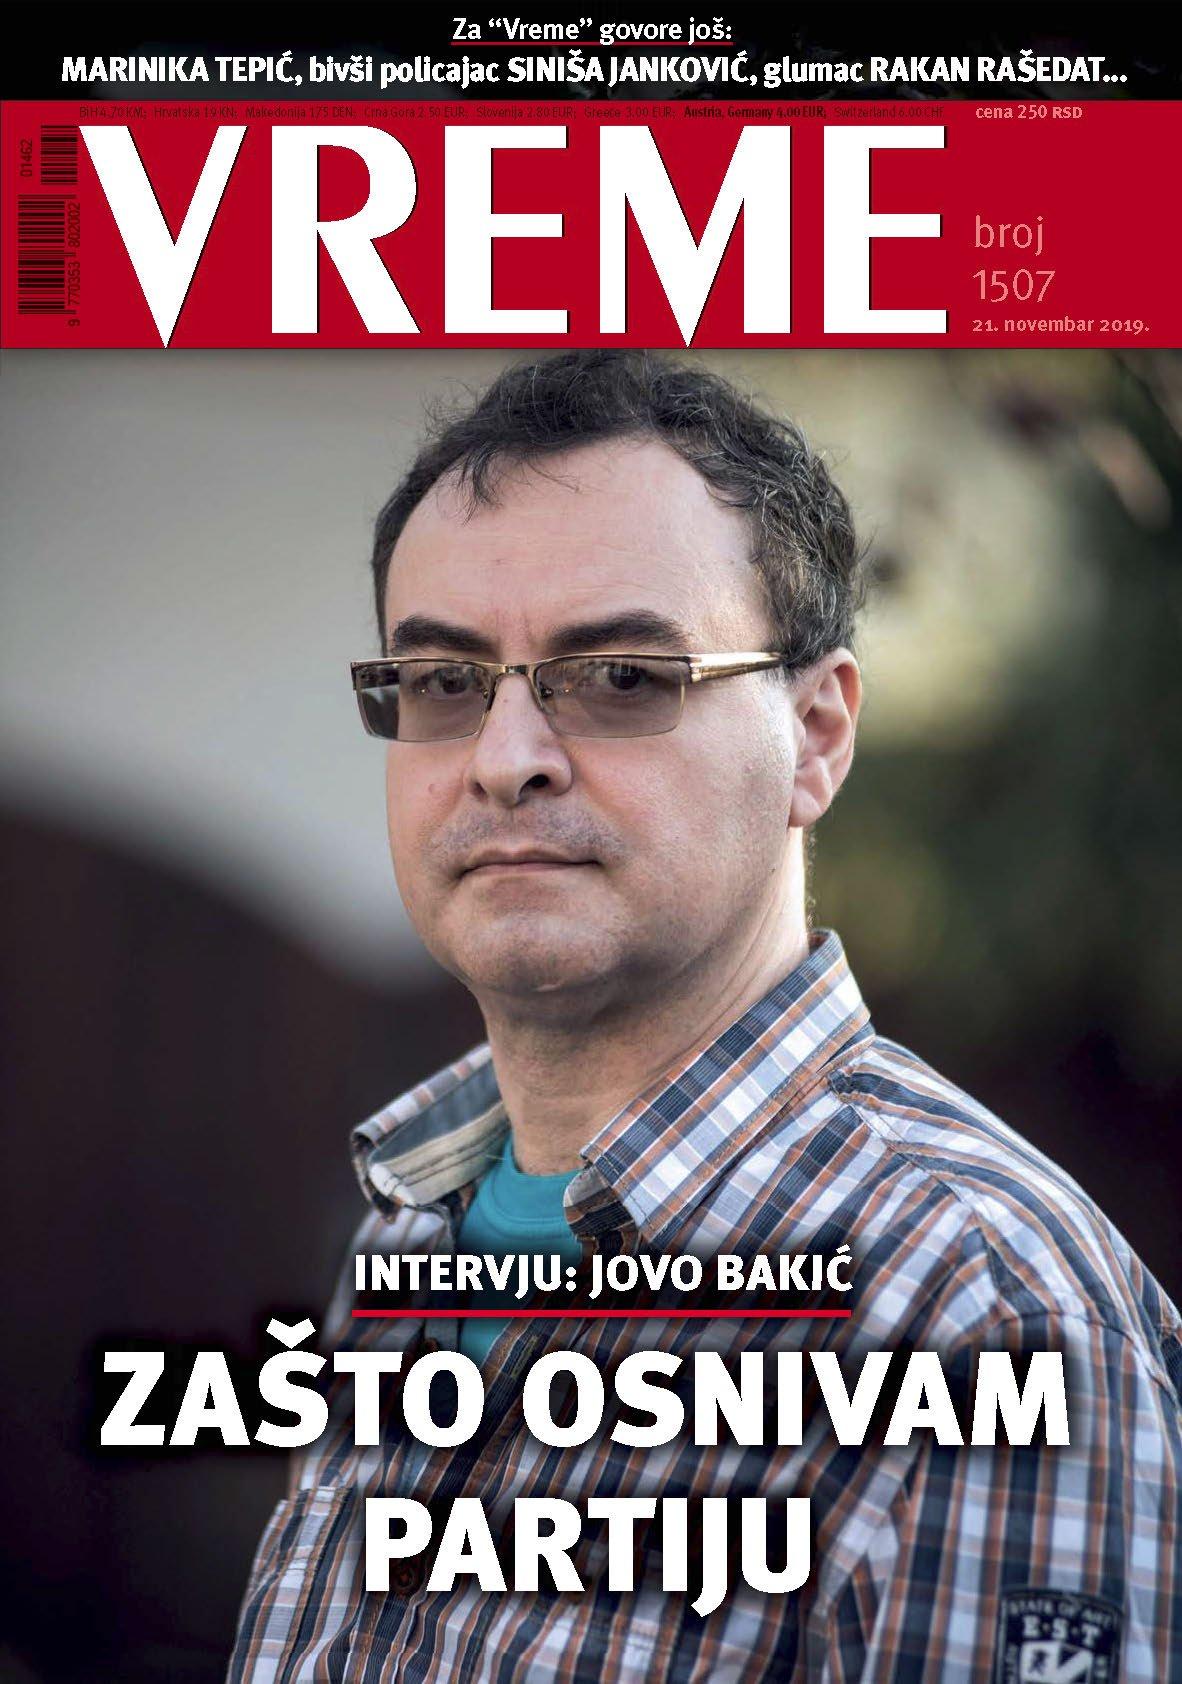 Lepo, Lepše, Jovo EJ1yTMuXYAEsBy5?format=jpg&name=large